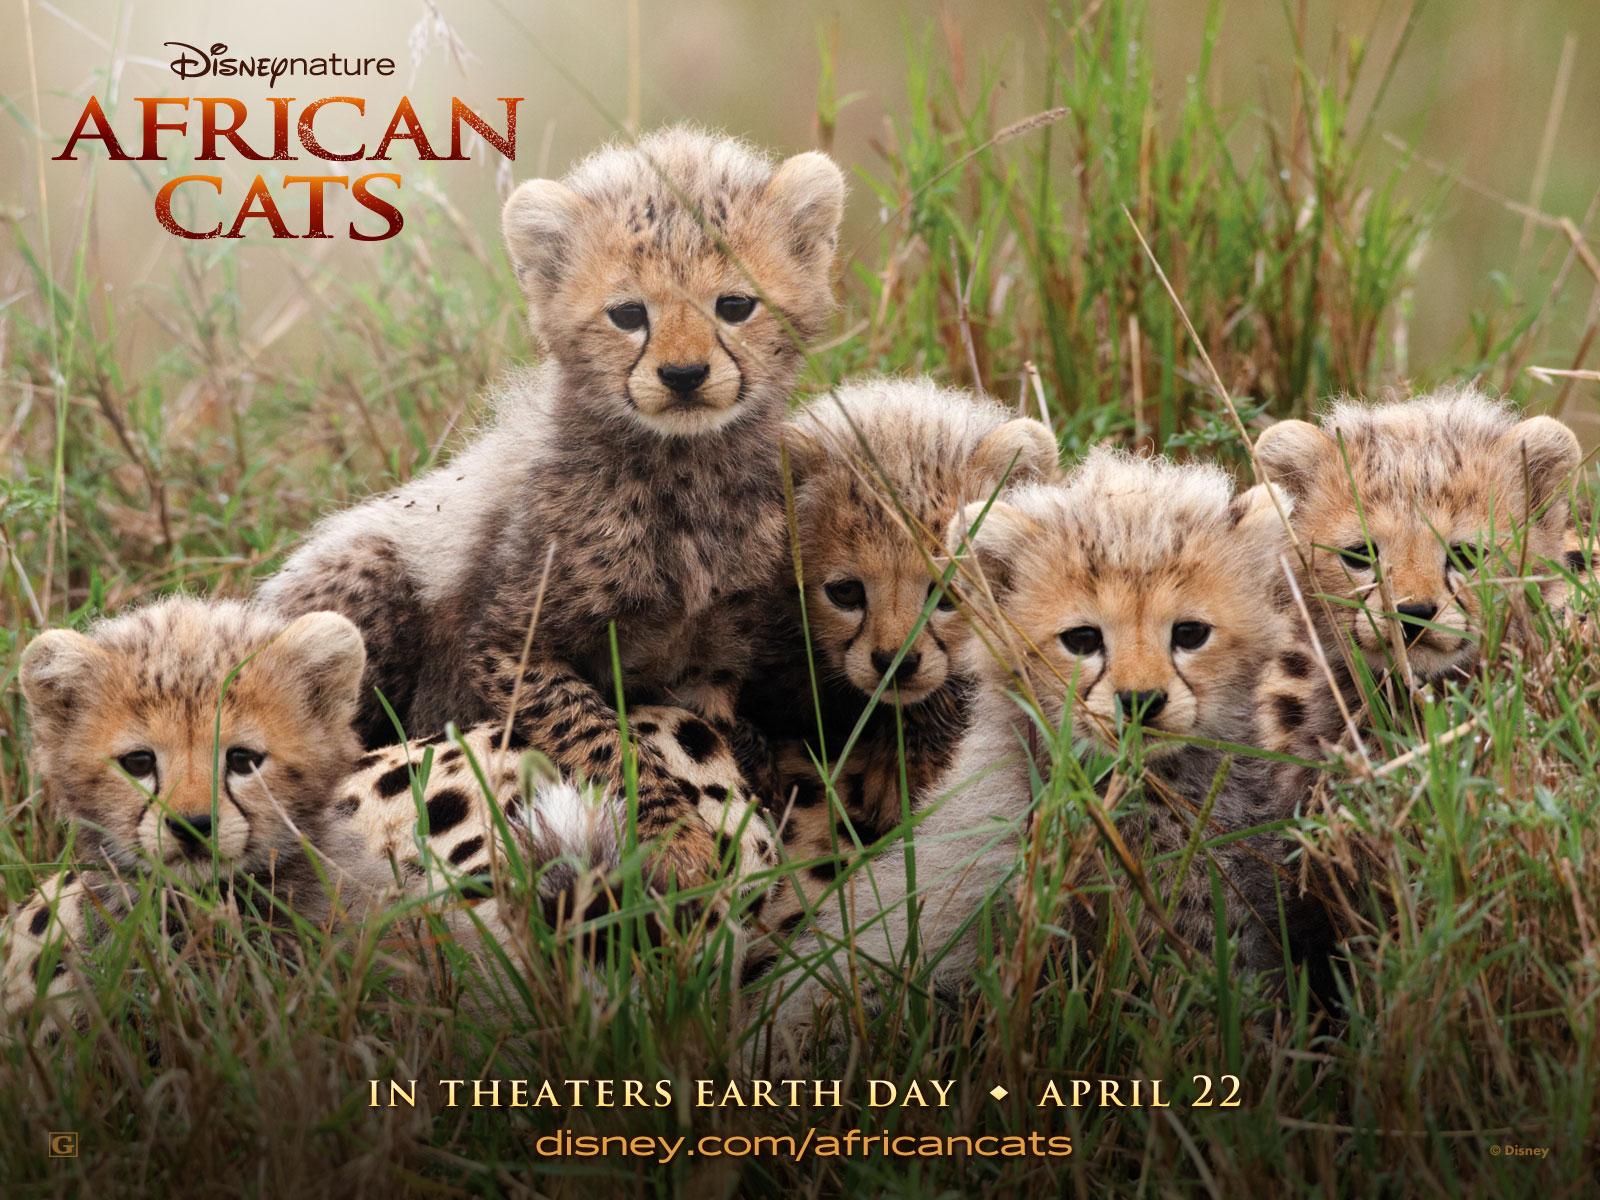 https://3.bp.blogspot.com/-olr9v8xdUQg/TacdHssvU-I/AAAAAAAAAbg/sp4Ywxq_SnU/s1600/African-Cats-Wallpapers-1600x1200-1.jpg